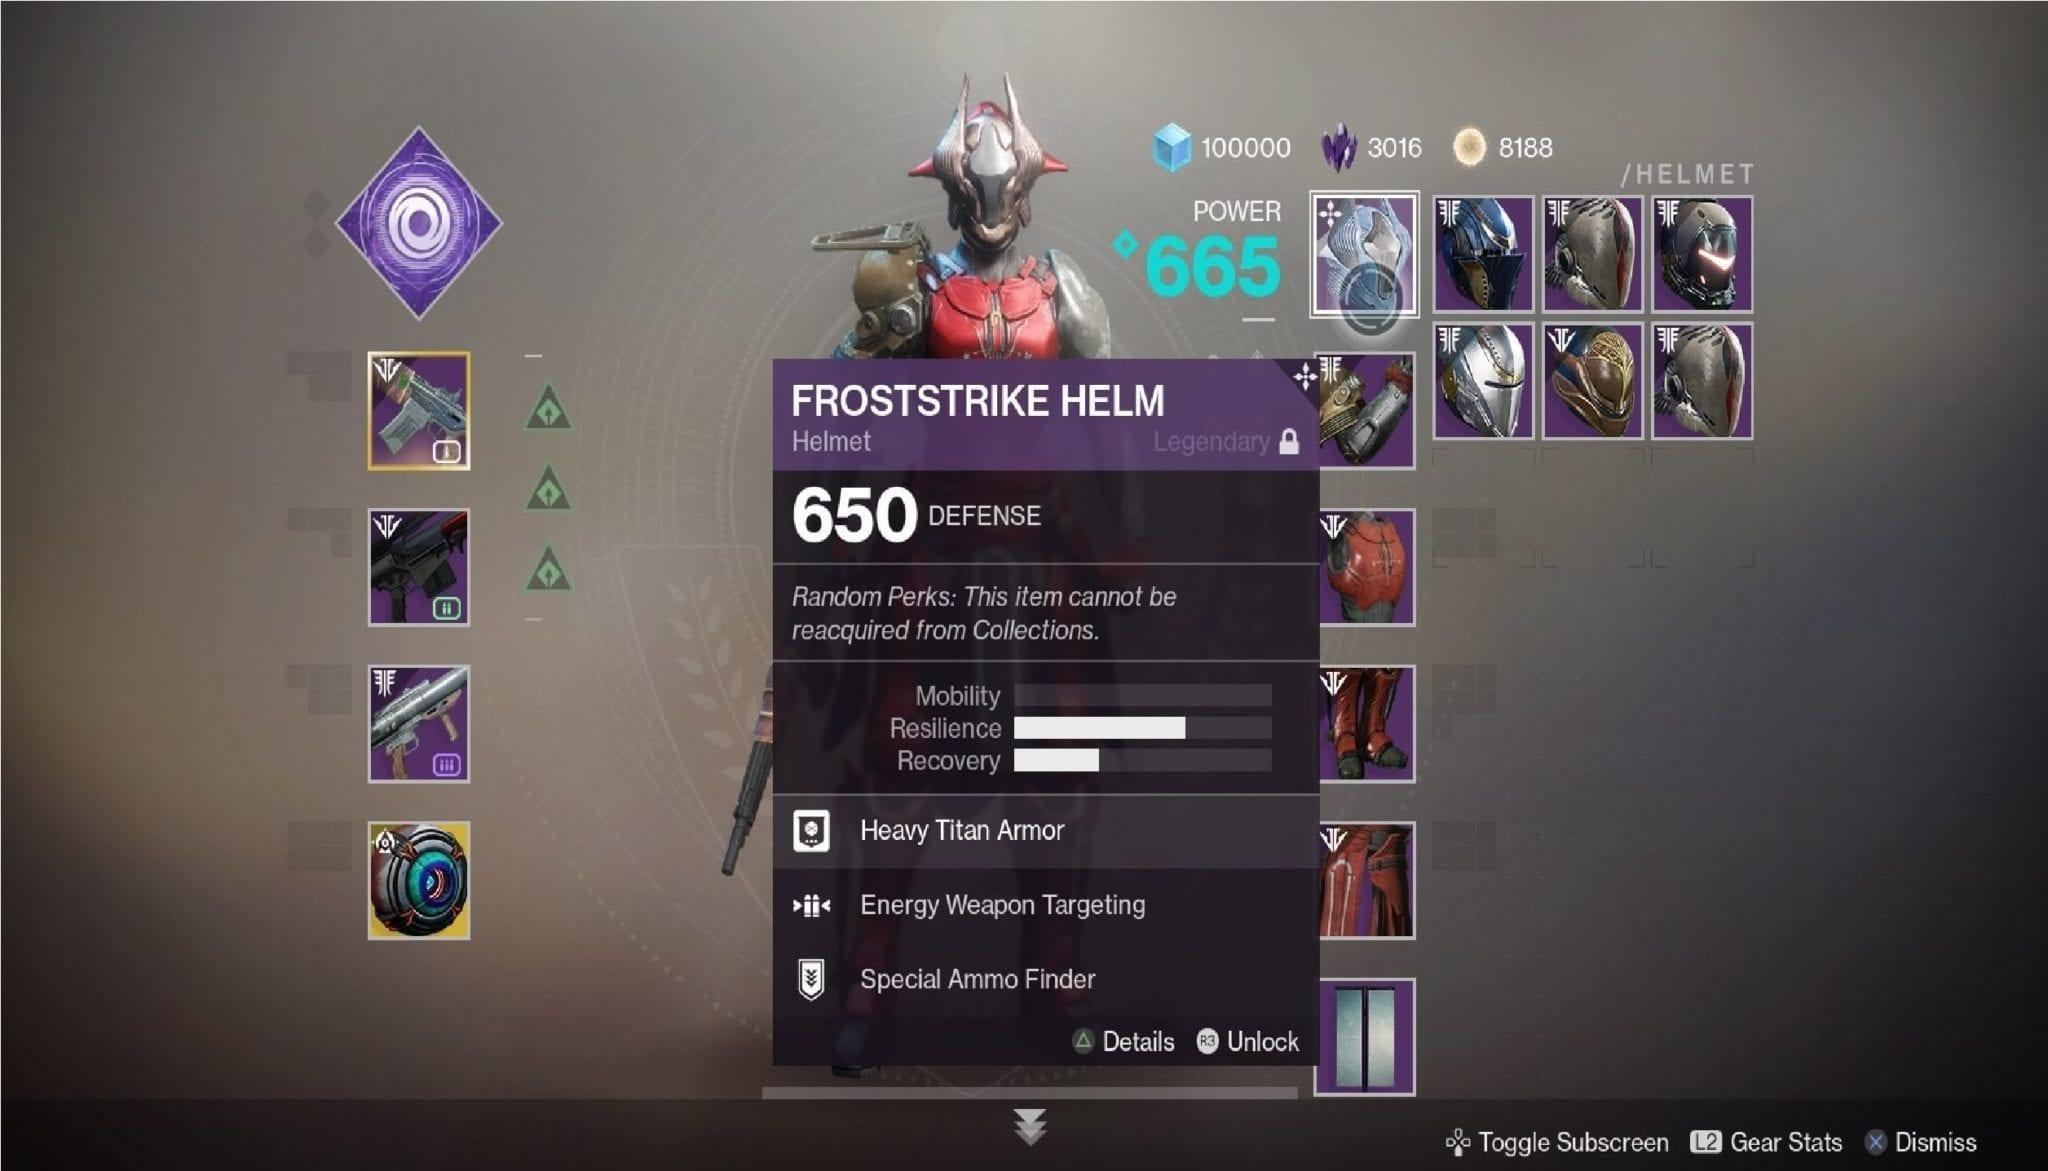 Destiny 2: Joker's Wild Leveling Guide - Getting to 700